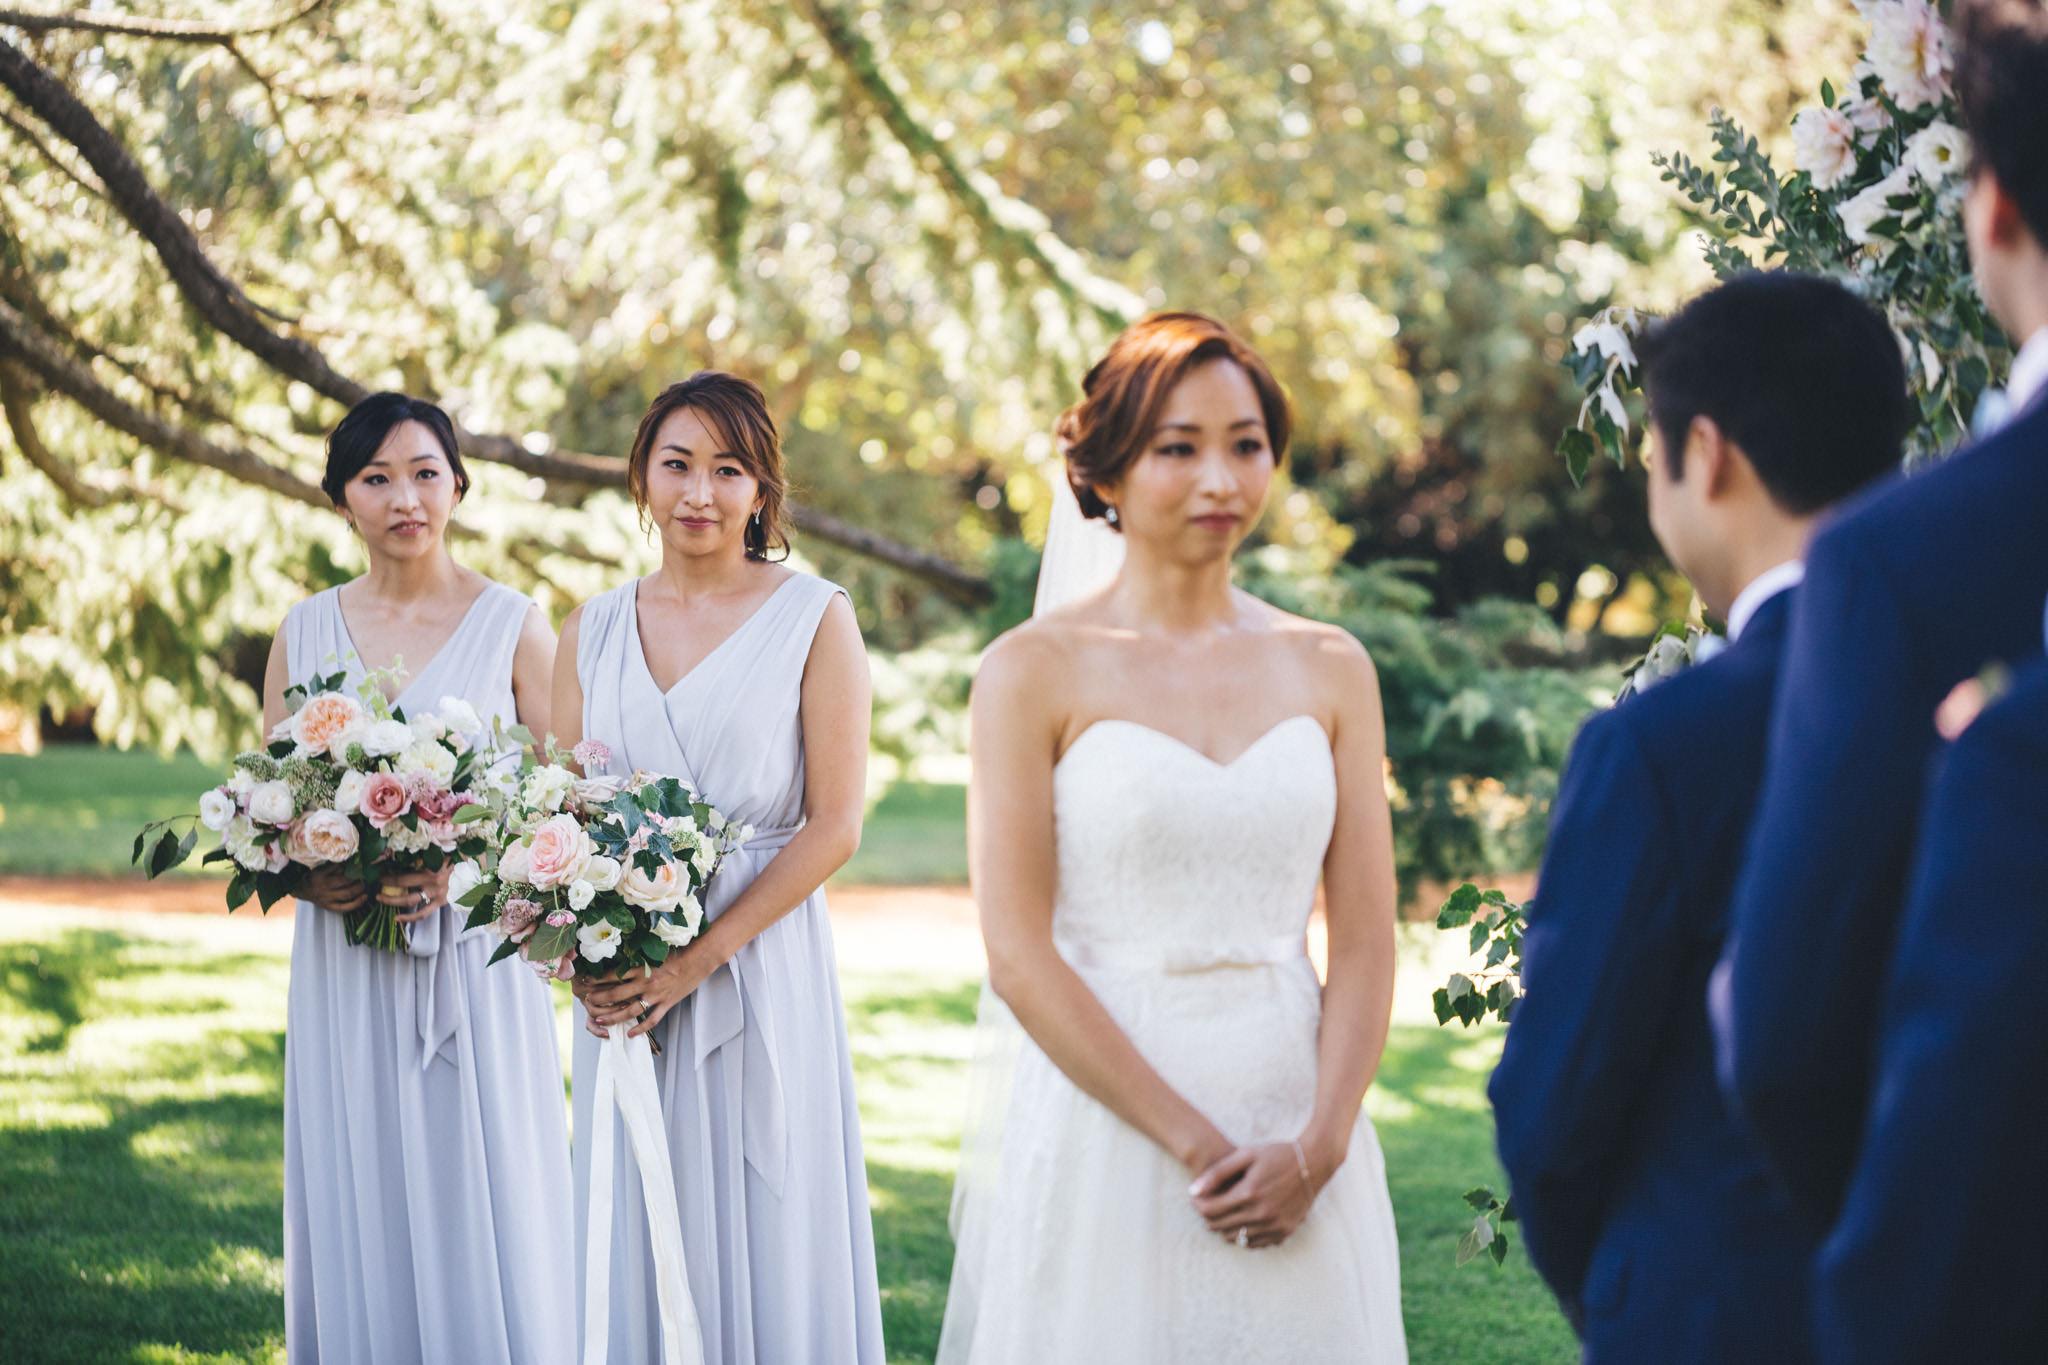 Ann-Marie-Yuen-Photography-0075.jpg